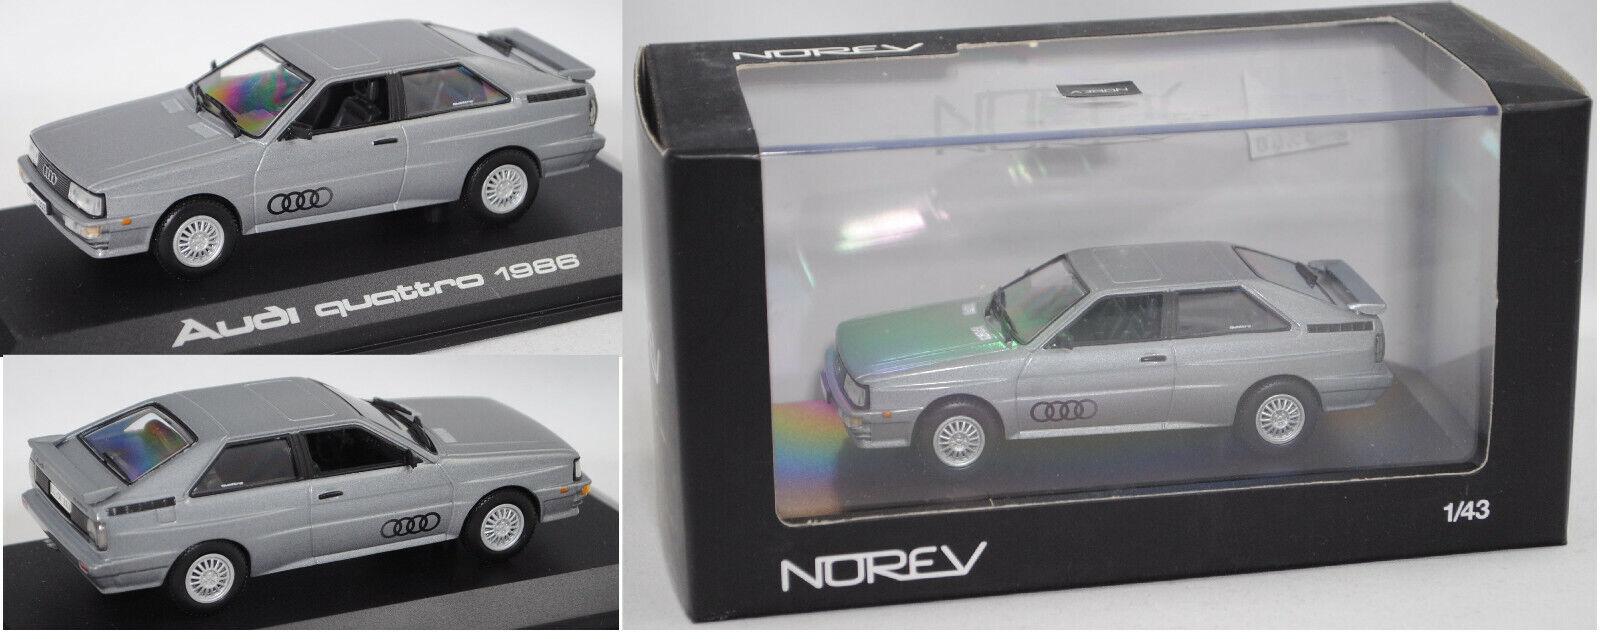 perfecto Norev 830031 Audi Quattro platagrismetalic platagrismetalic platagrismetalic 1 43  Ven a elegir tu propio estilo deportivo.